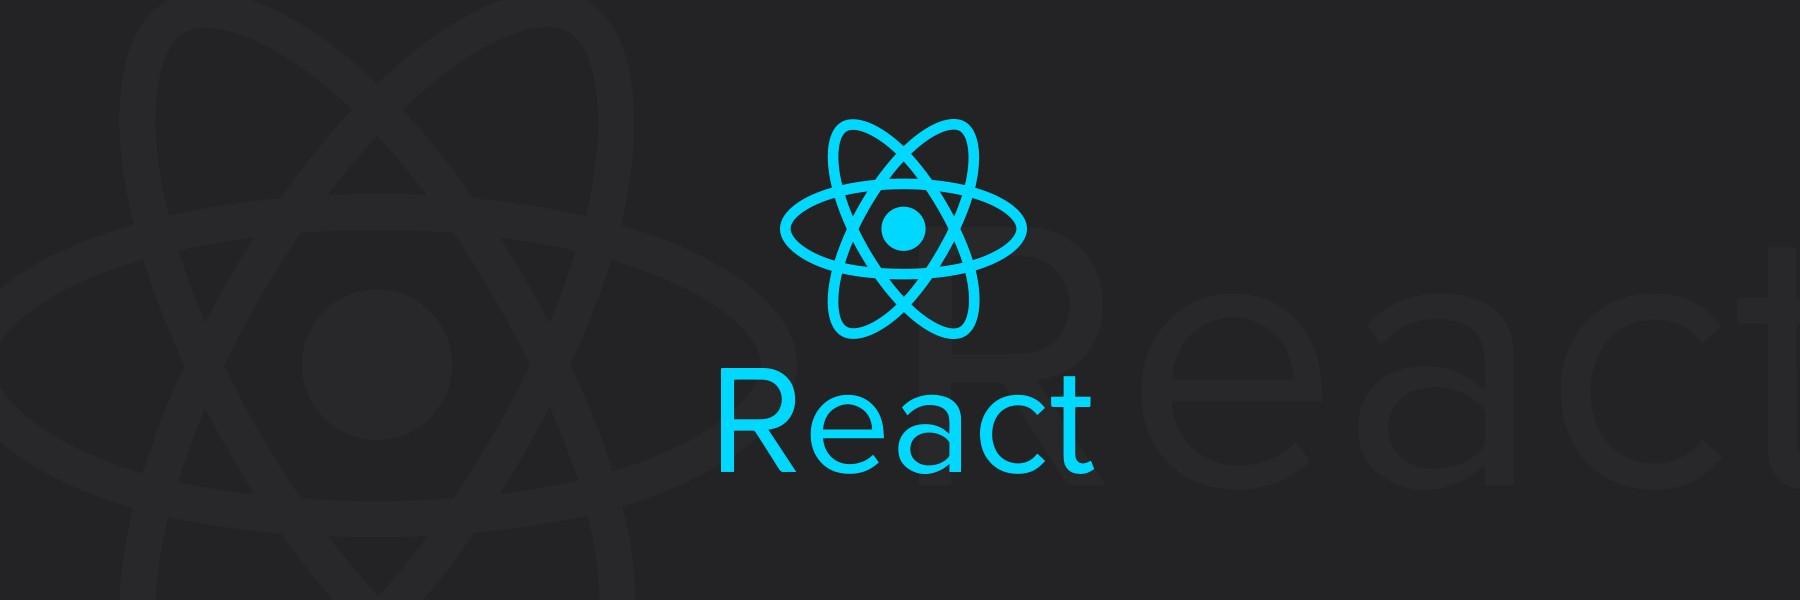 React passe sous licence MIT